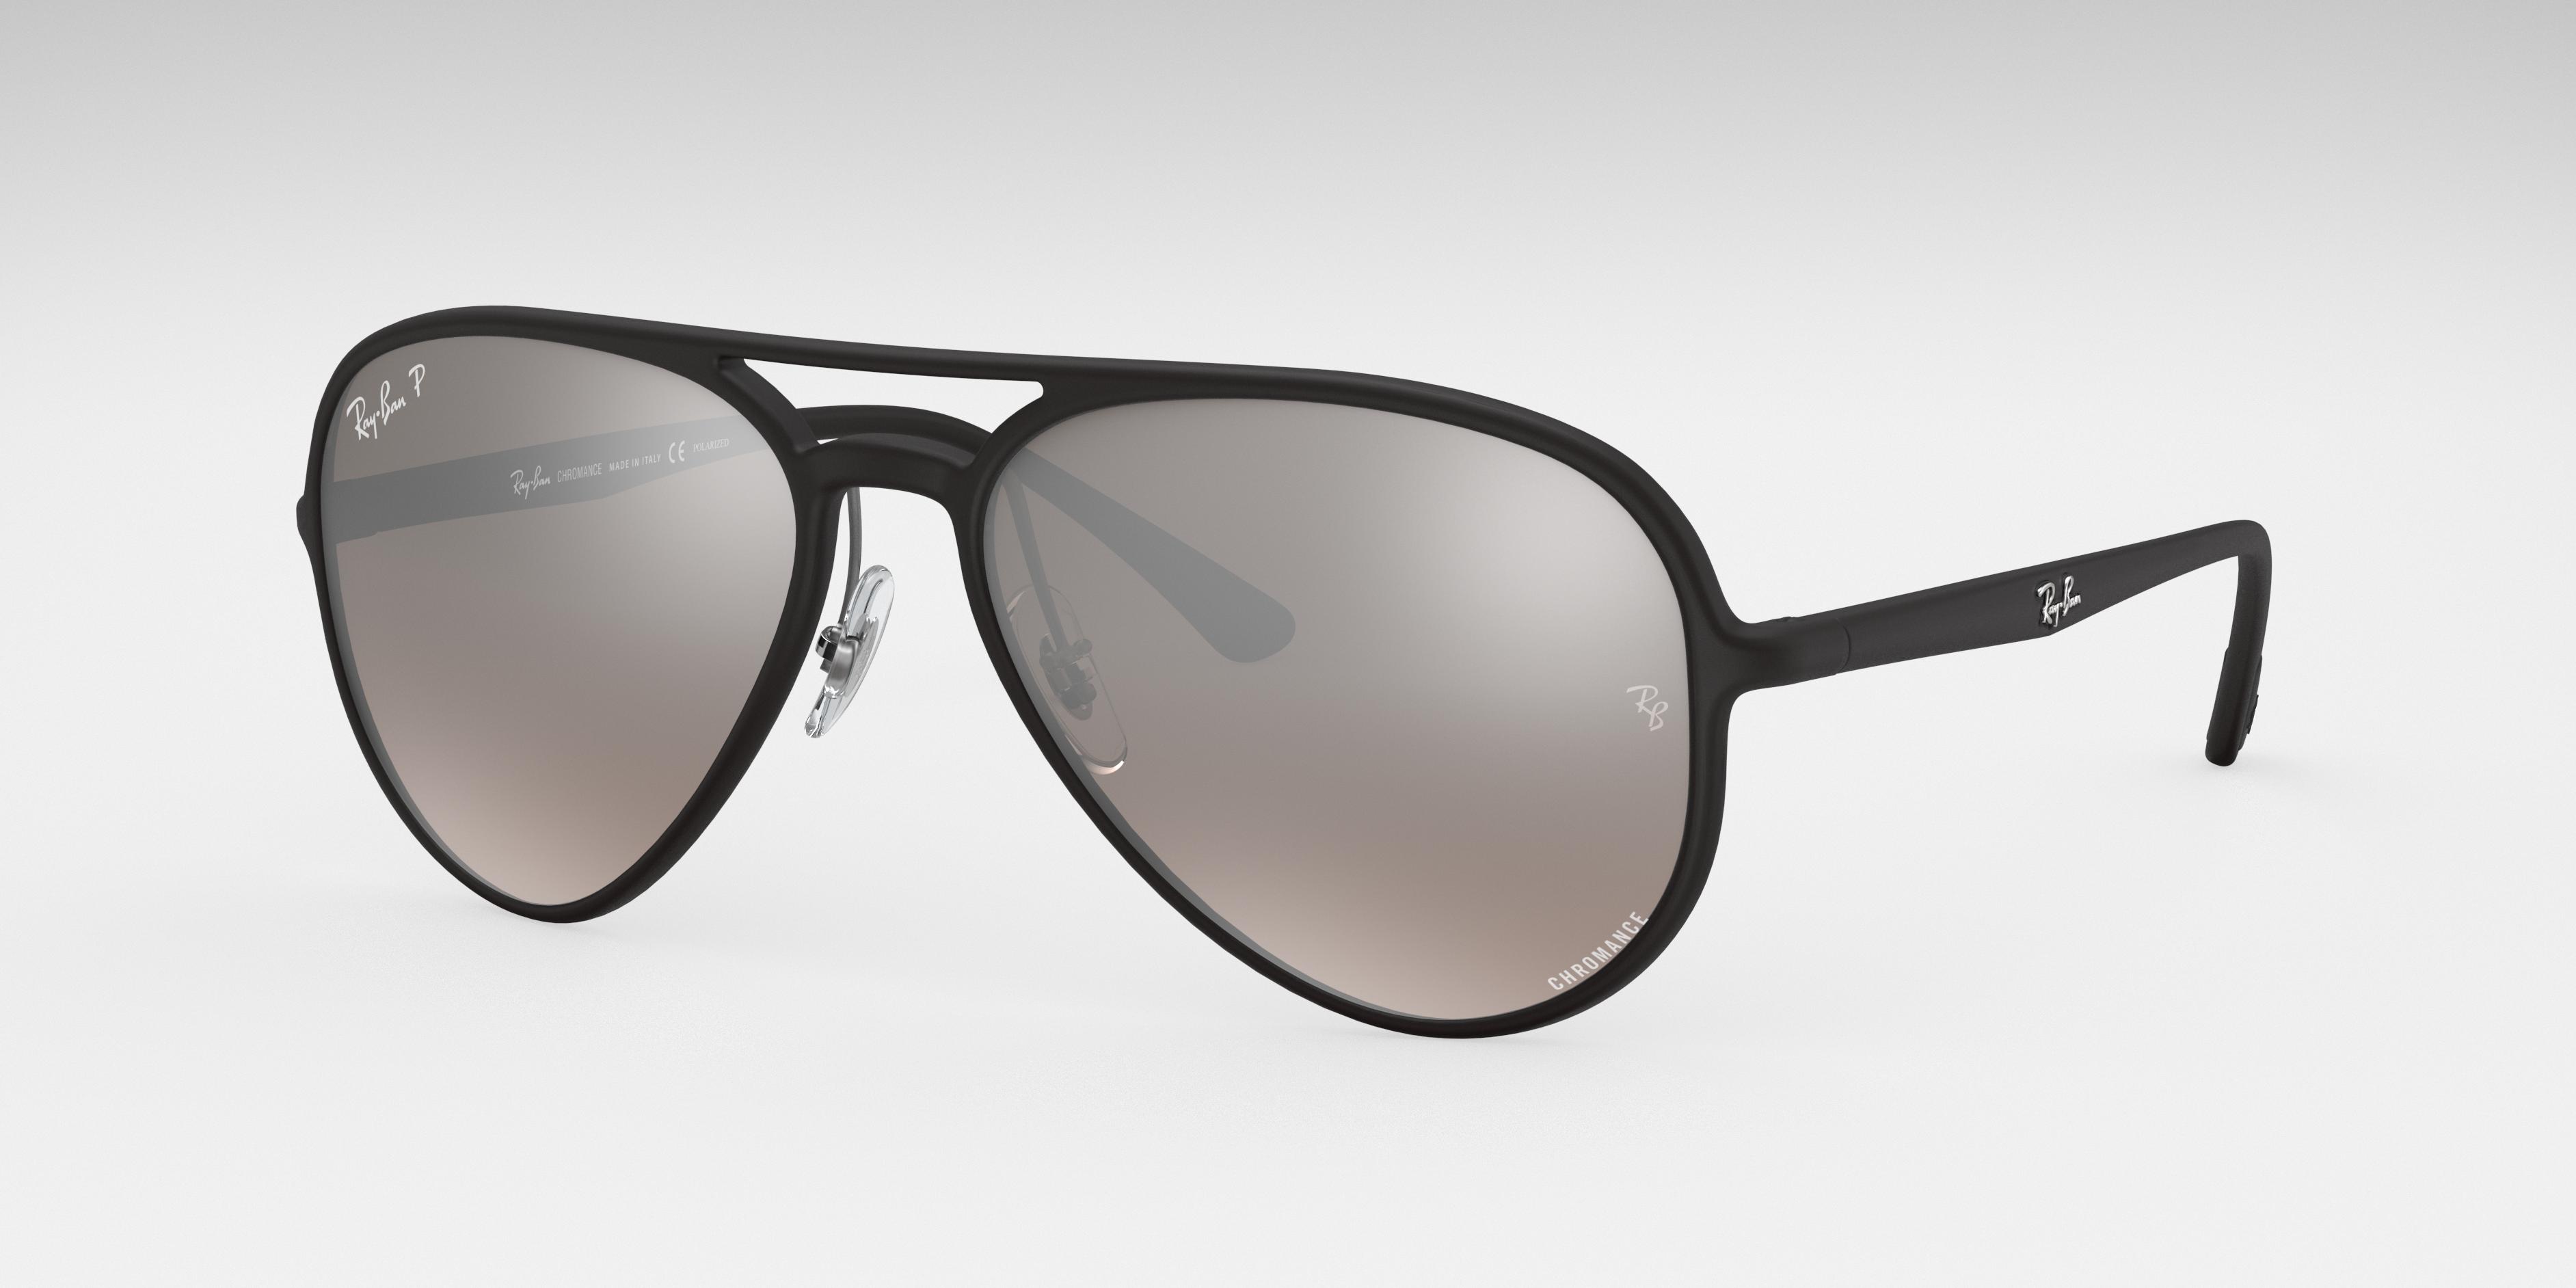 Ray-Ban Rb4320 Chromance Black, Polarized Gray Lenses - RB4320CH